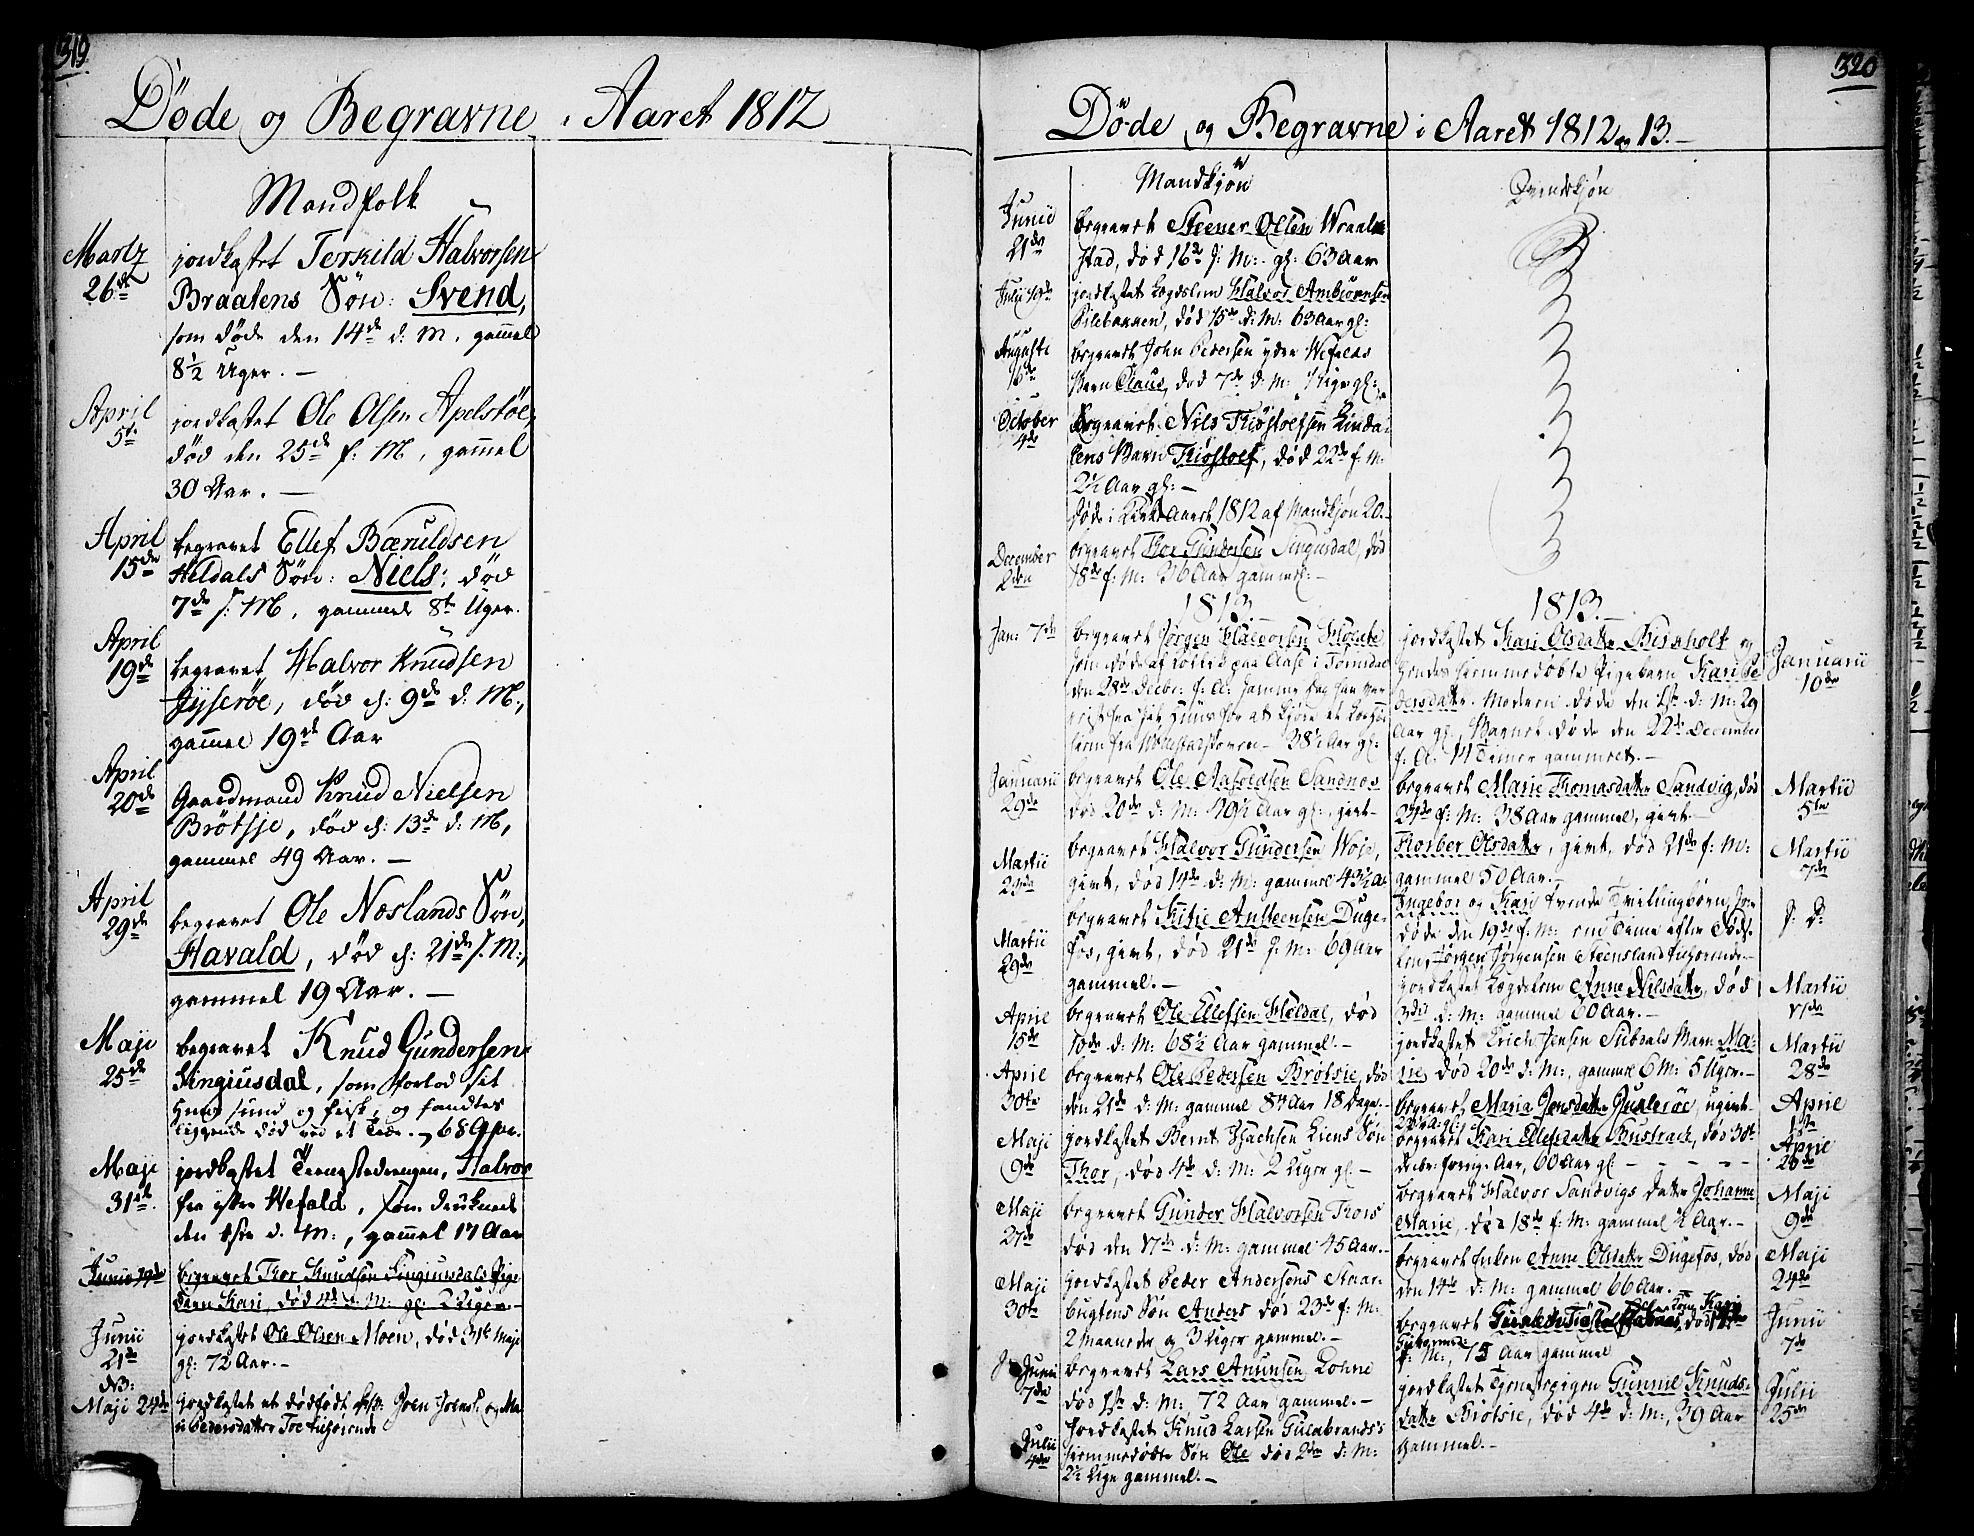 SAKO, Drangedal kirkebøker, F/Fa/L0003: Ministerialbok nr. 3, 1768-1814, s. 319-320